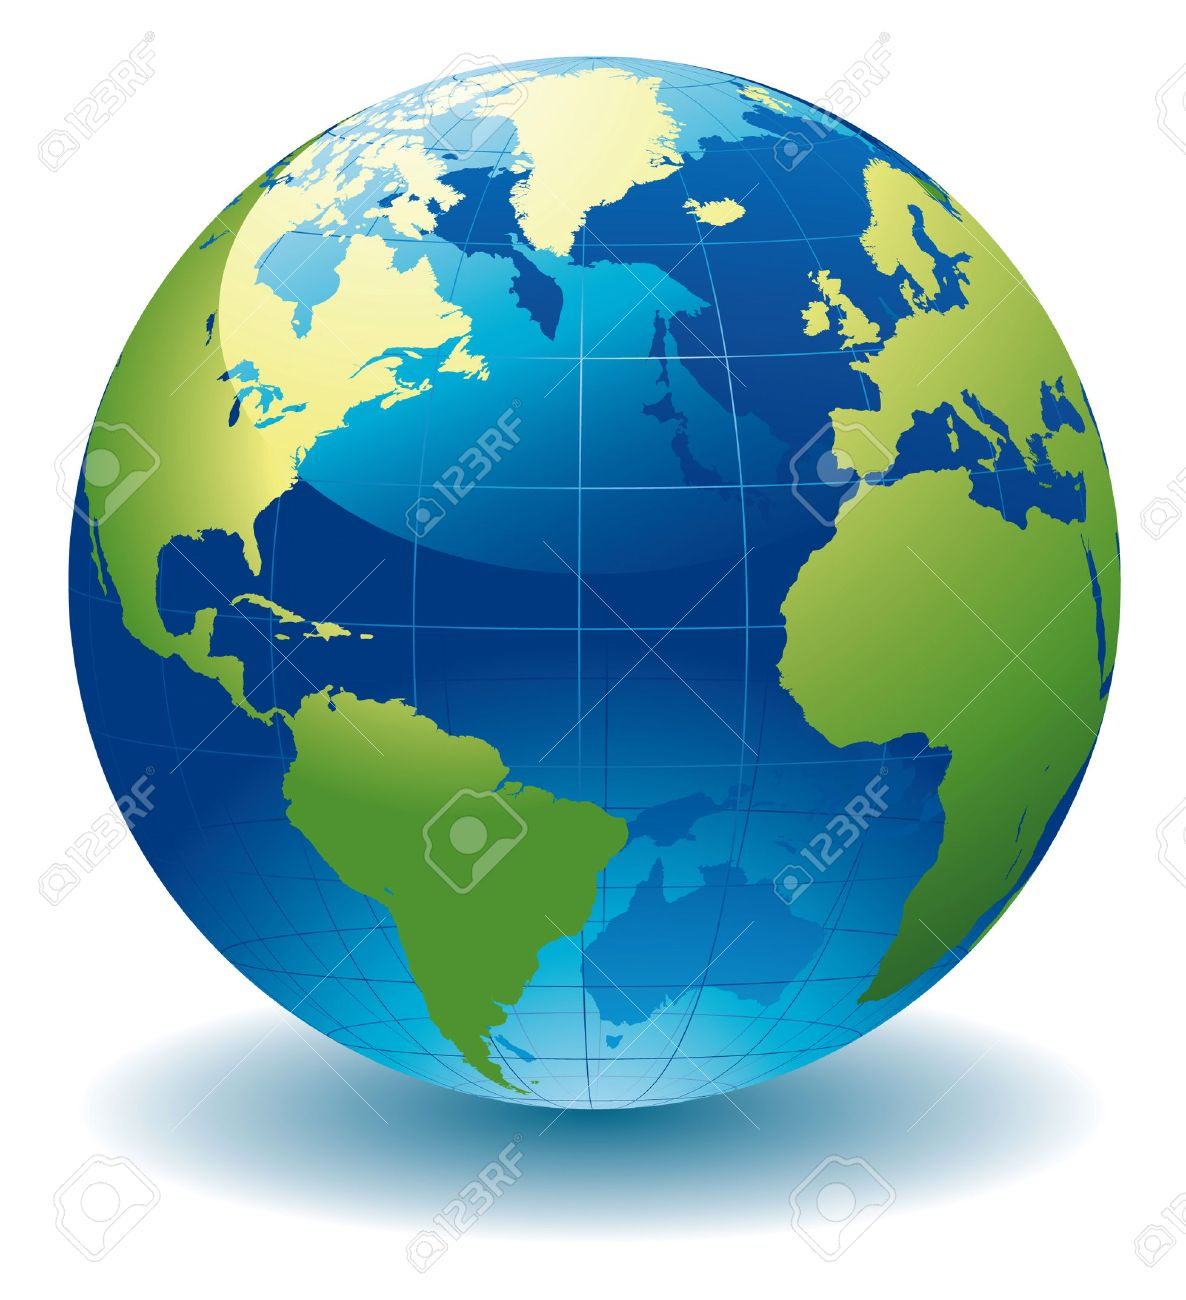 In ce continent e aceasta tara? (Varianta usoara)